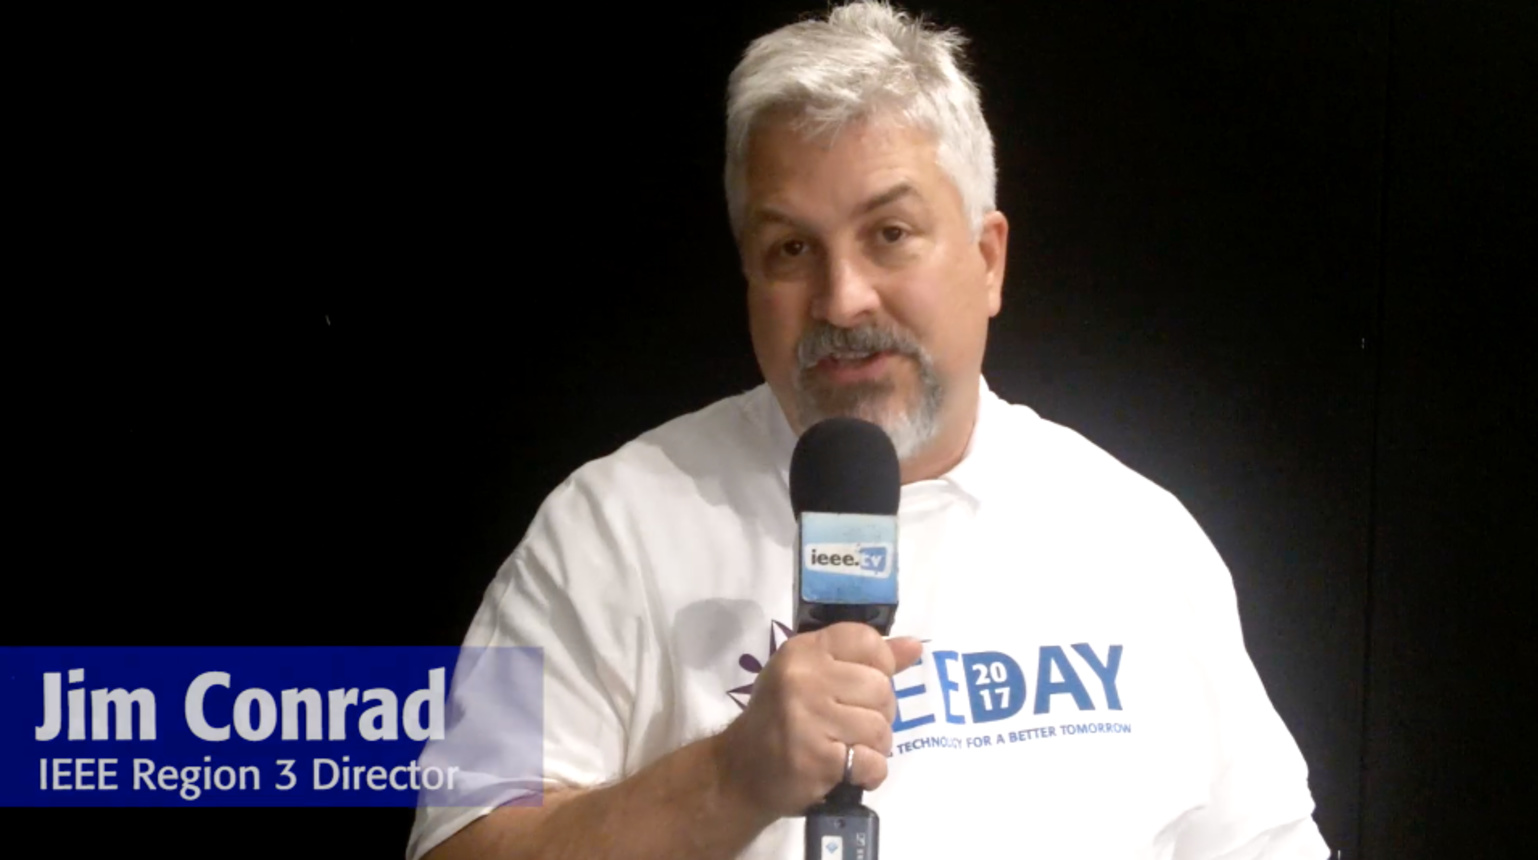 IEEE Day 2017 Testimonial: Jim Conrad